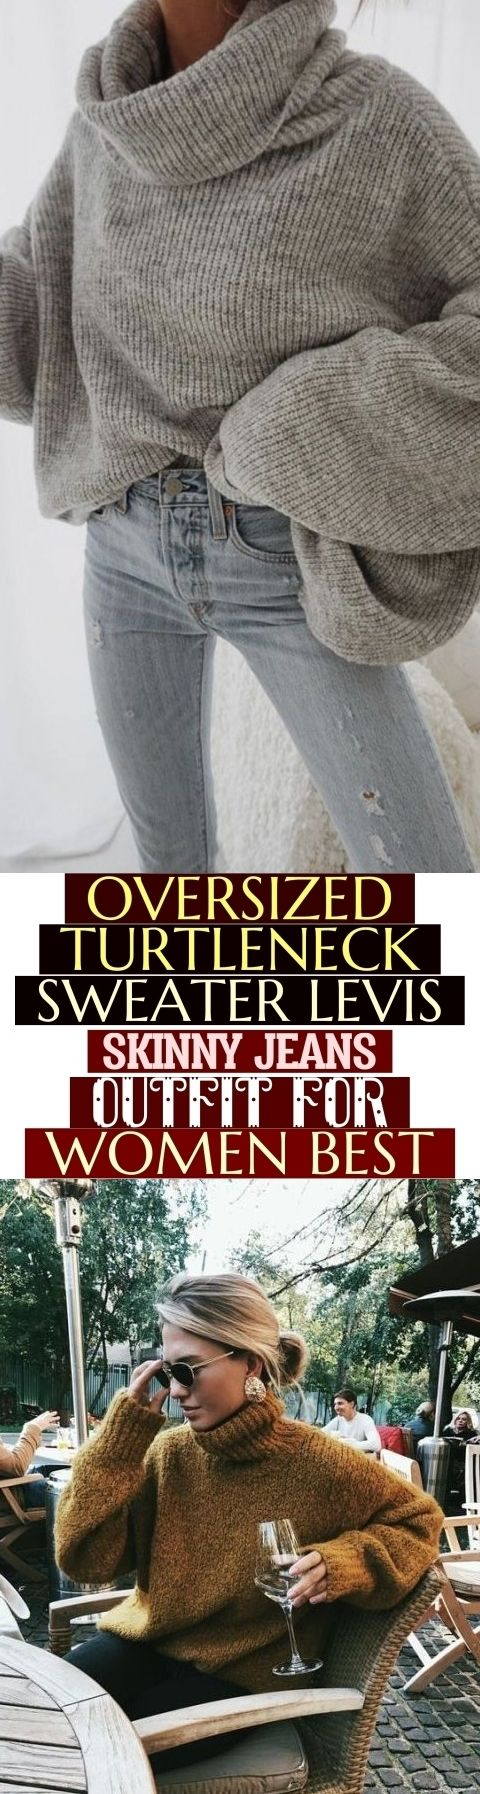 Oversized Turtleneck Sweater Levis Skinny Jeans Outfit For Women Best # #women #…